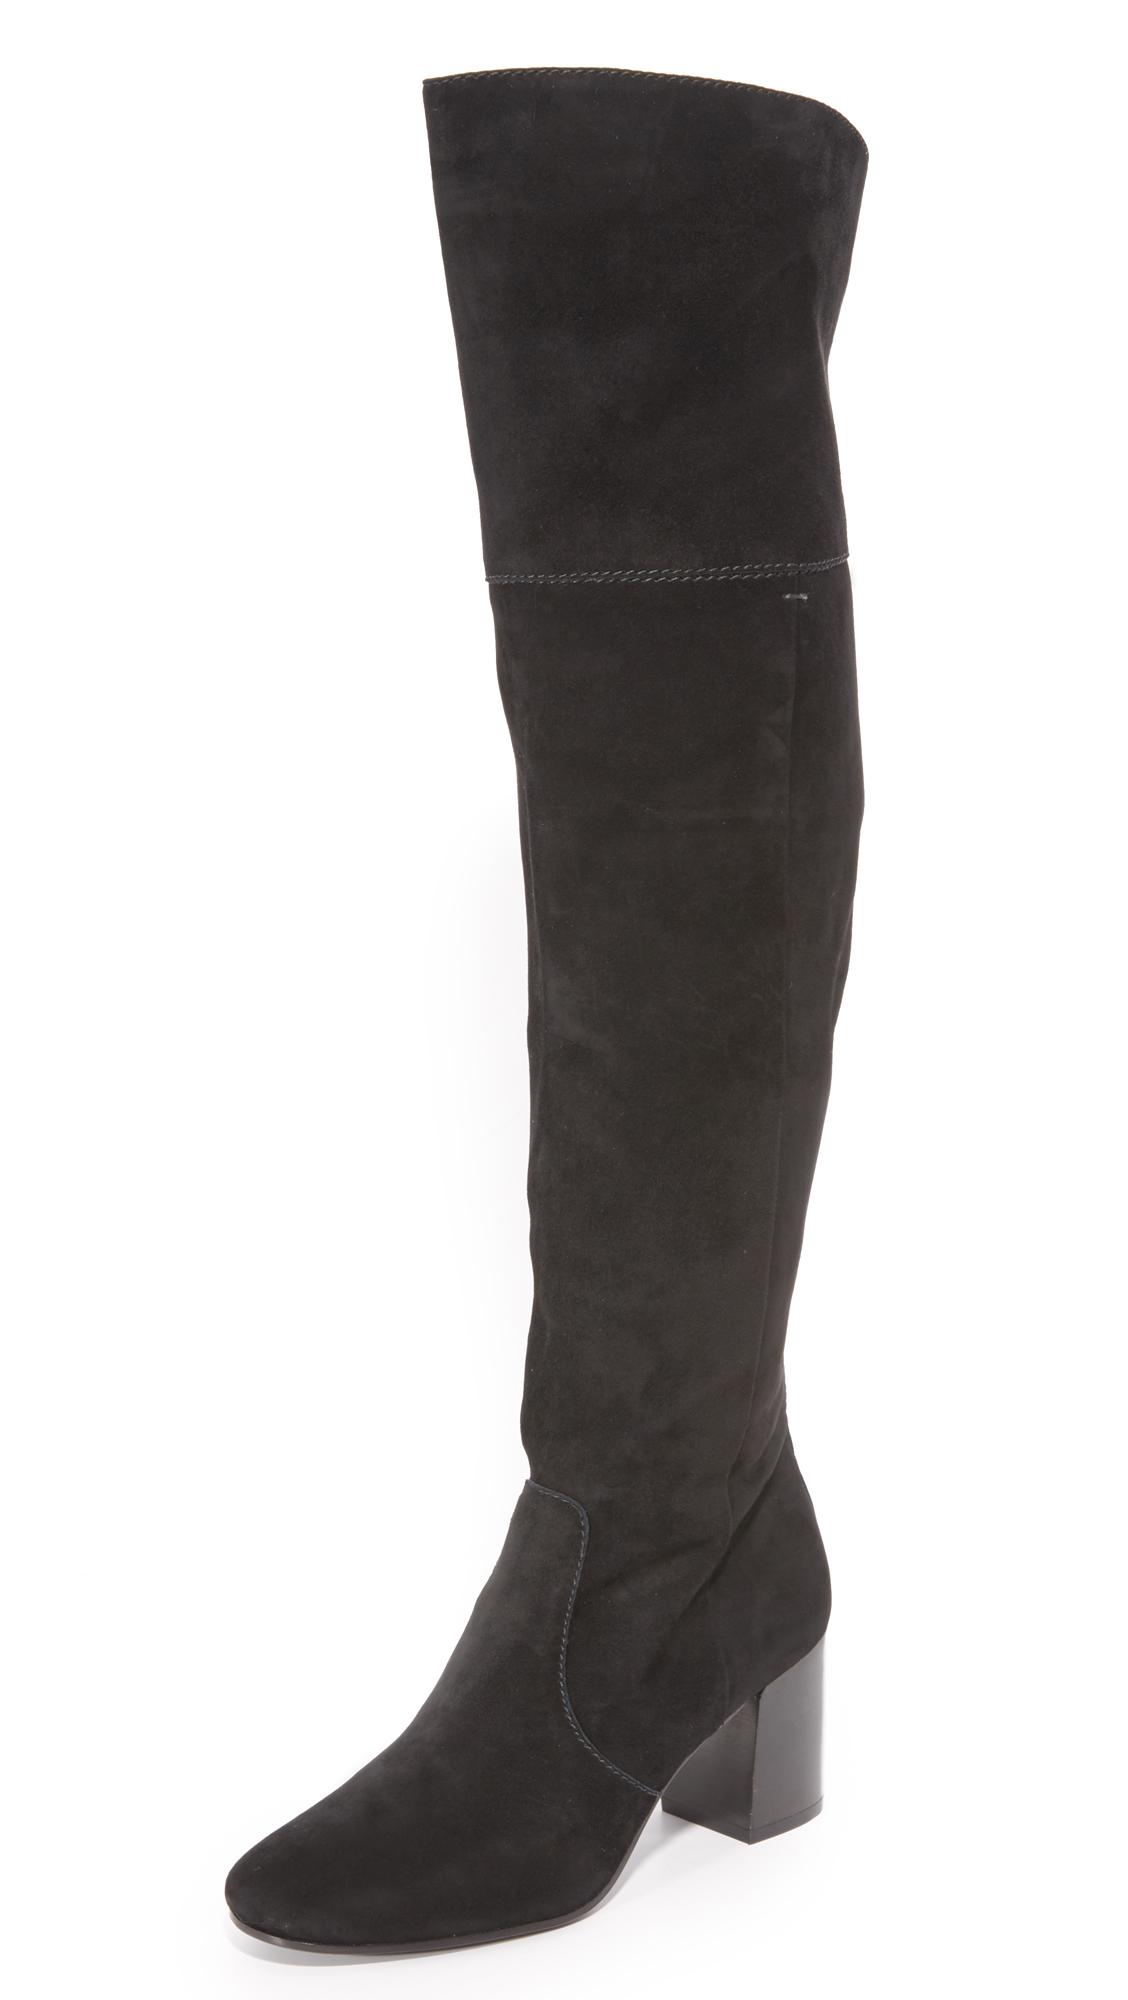 Frye Jodi Over The Knee Boots - Black